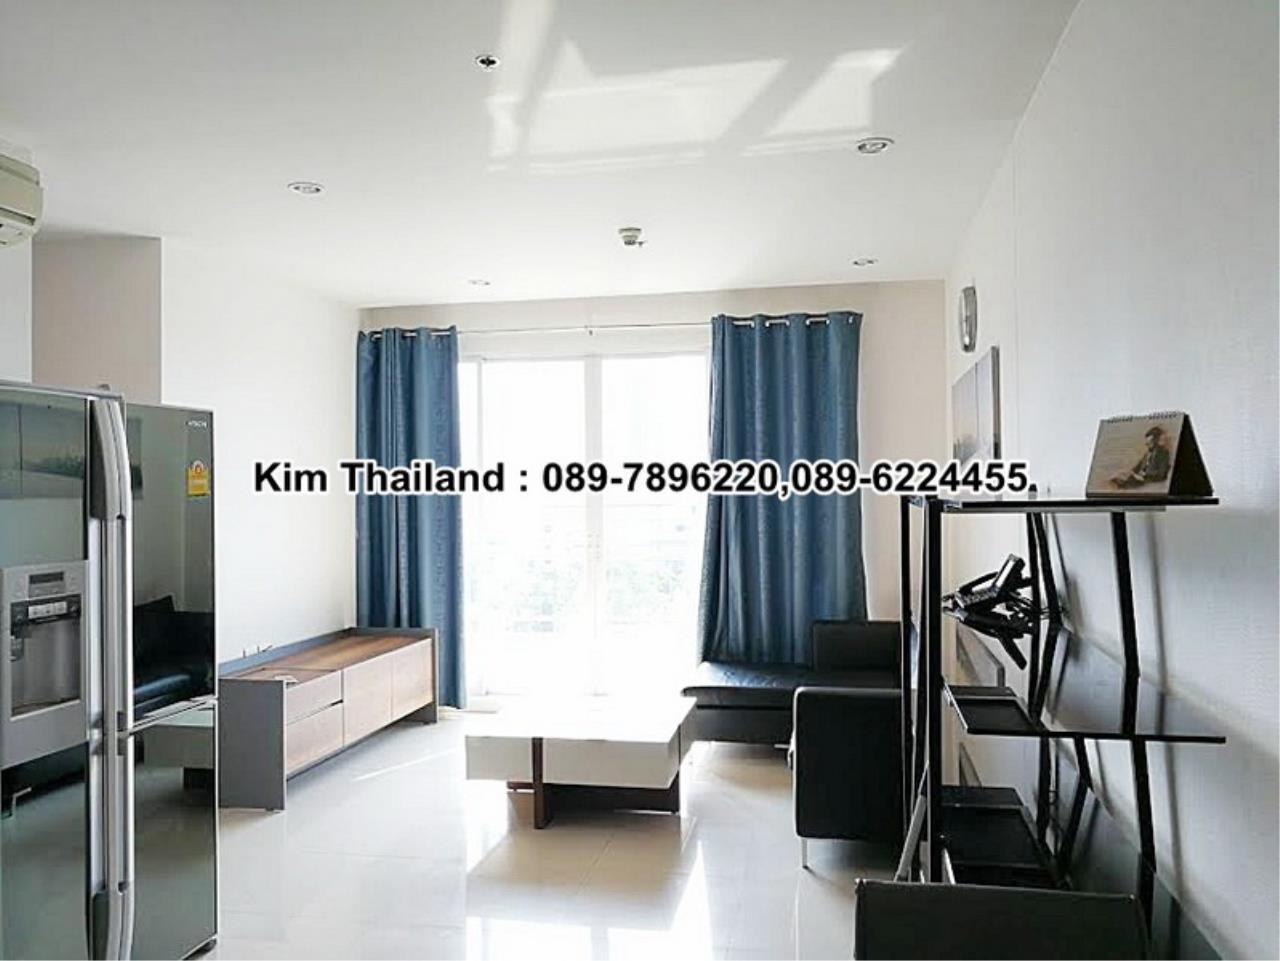 BKKcondorental Agency's For rent, Circle Condominium.  Area 76 sq.m. 2 bedrooms. Rental 35000THB/month. 4